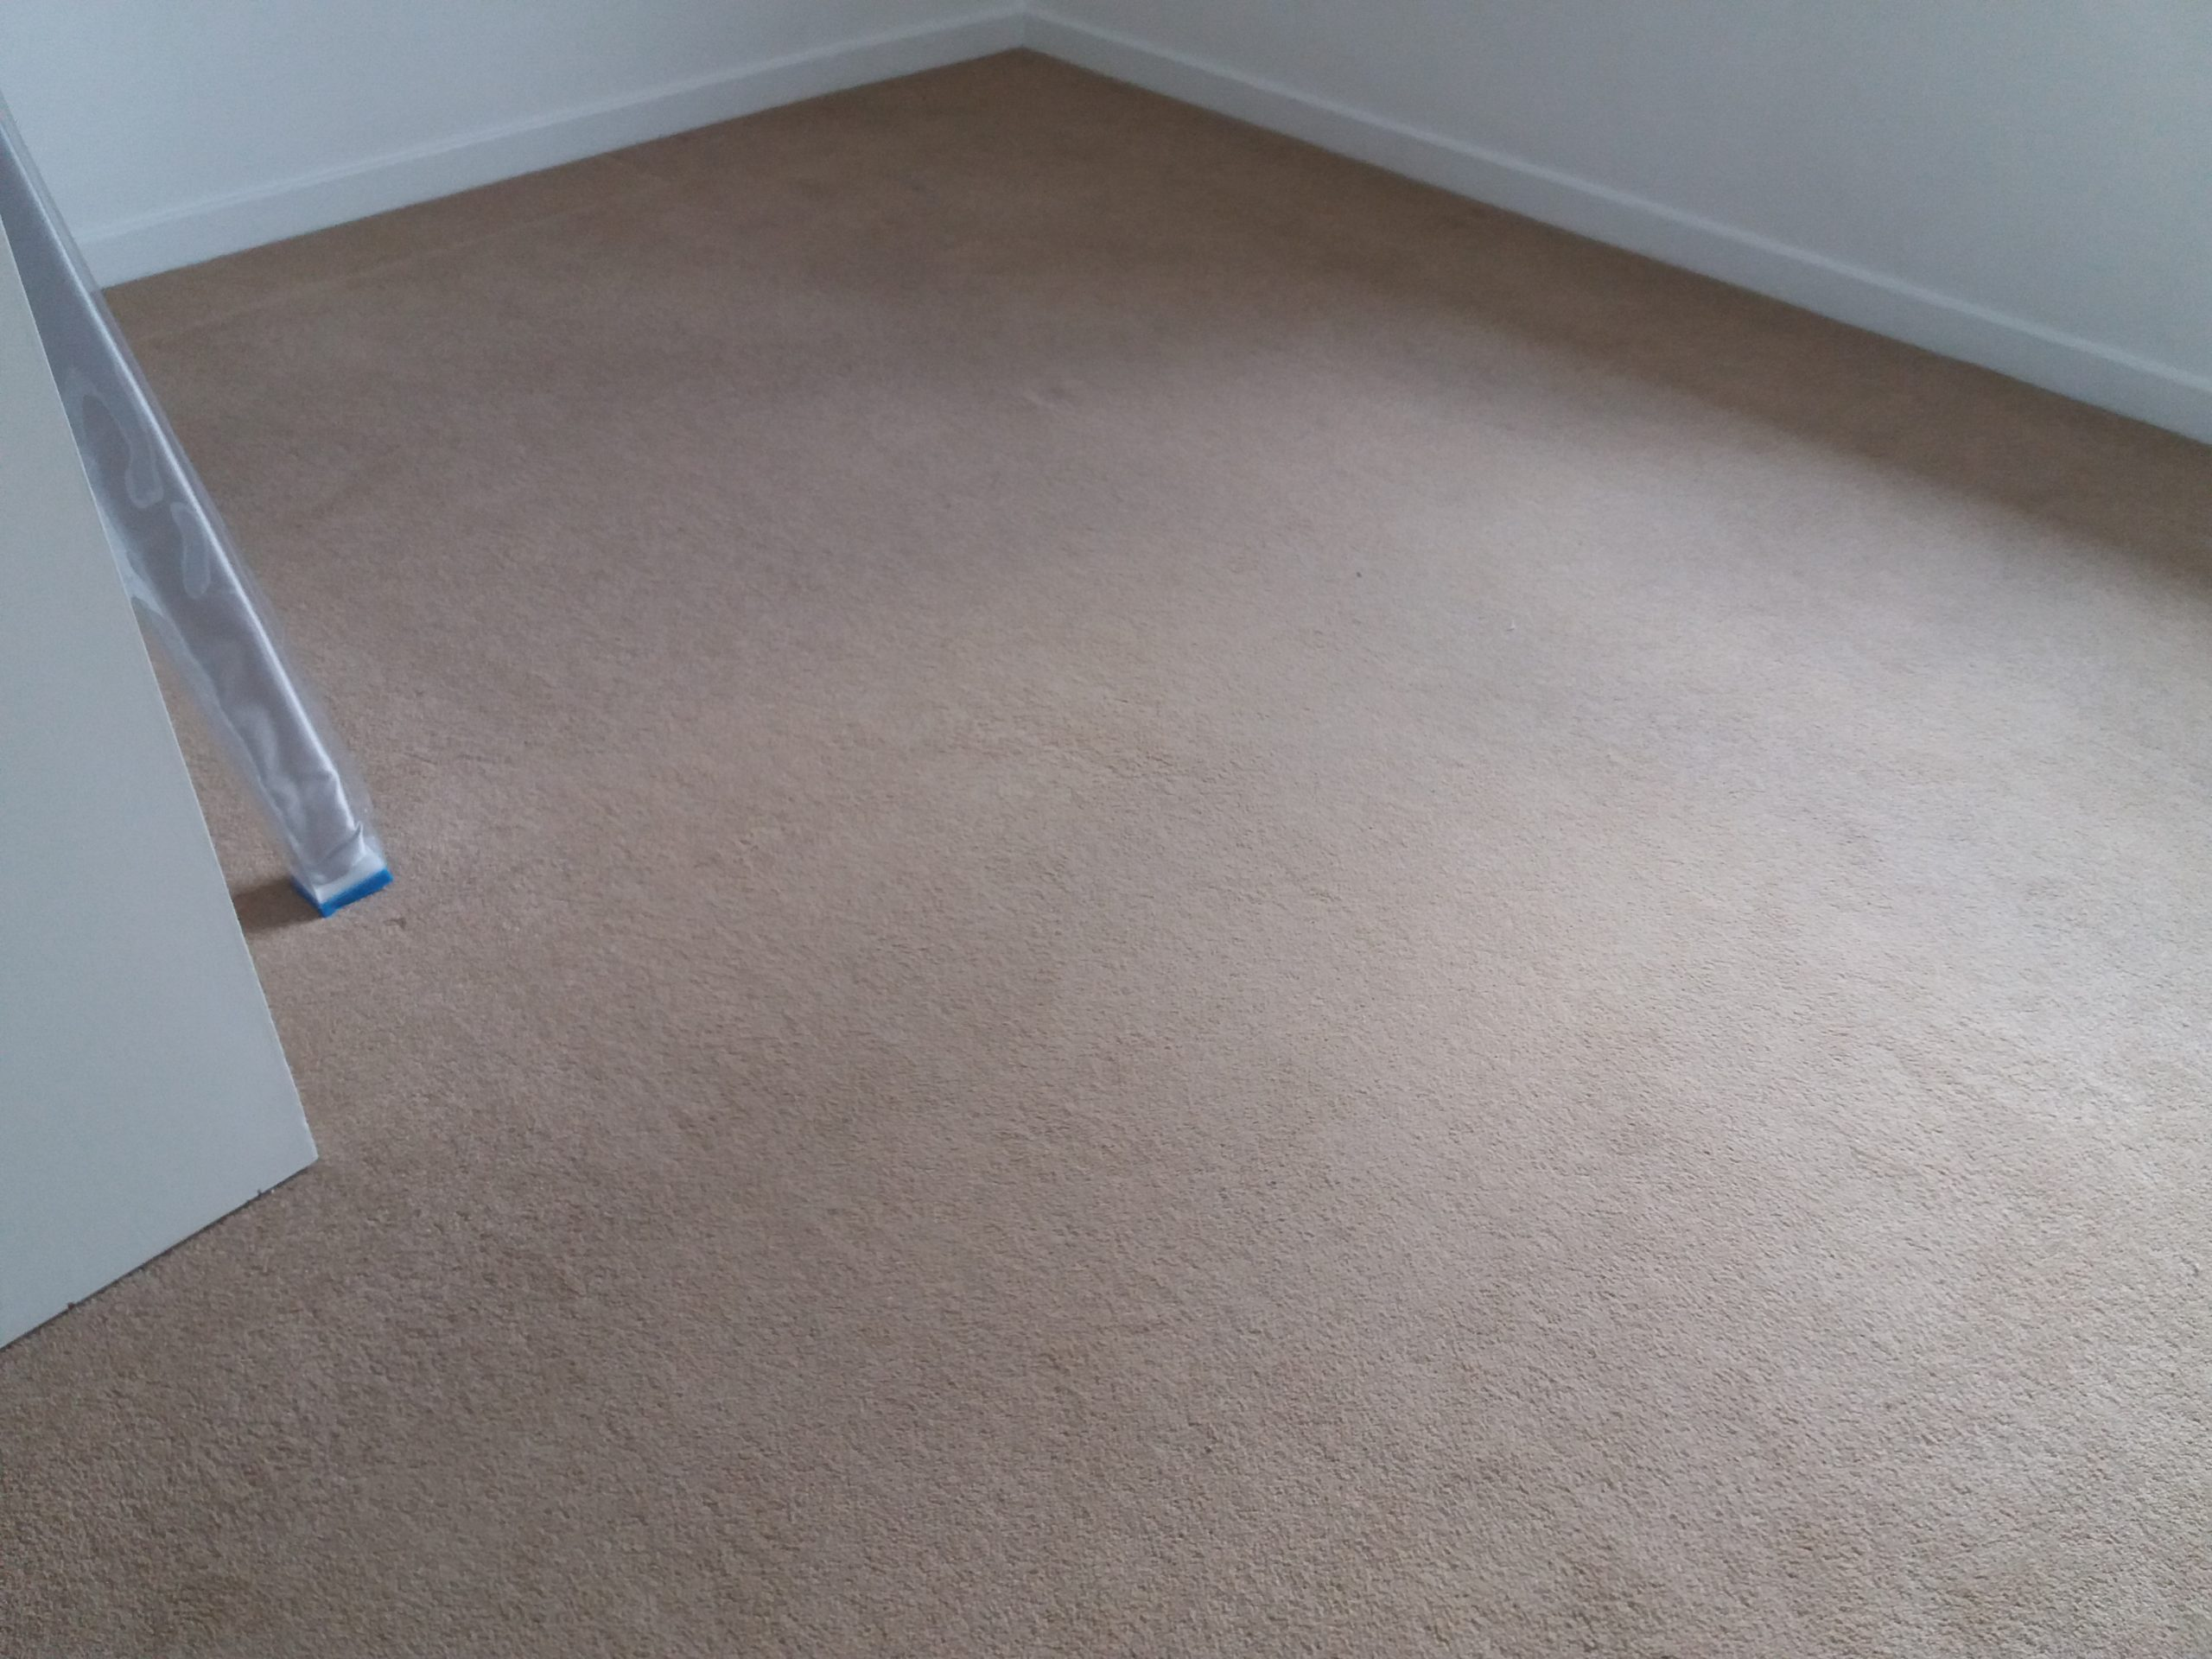 carpet cleaning in adderbury